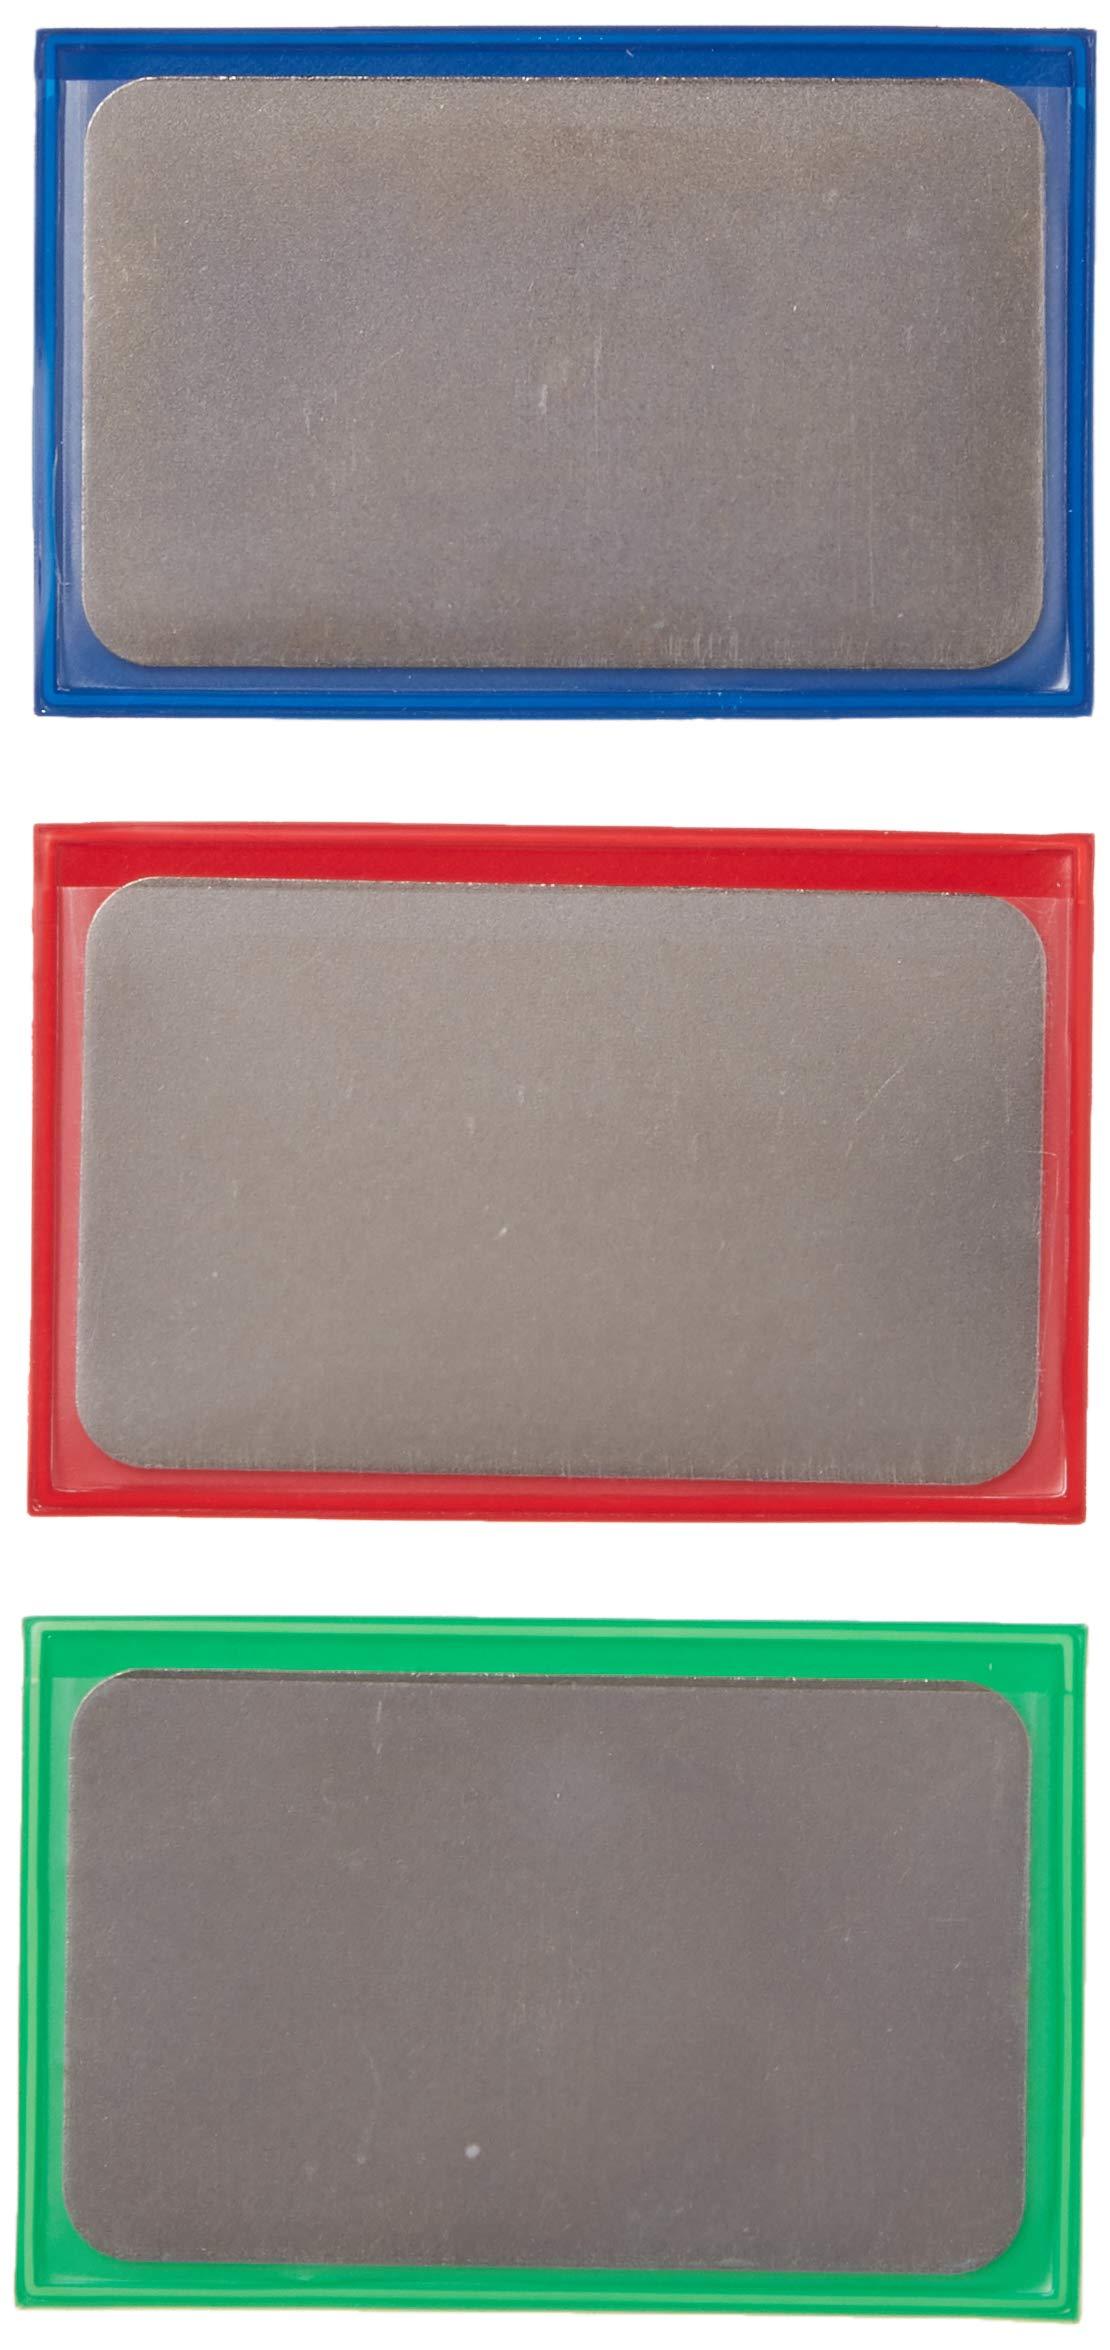 DMT D3EFC 3-inch Dia-Sharp Sharpener, Credit Card Sized- Extra-Fine, Fine and Coarse Diamond -Set of 3